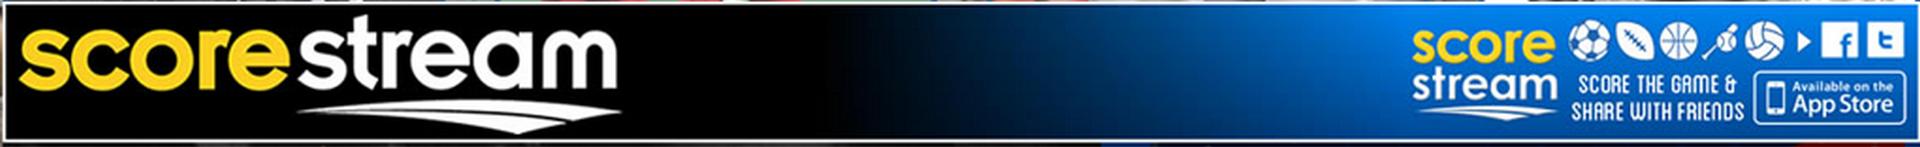 Score Stream Banner